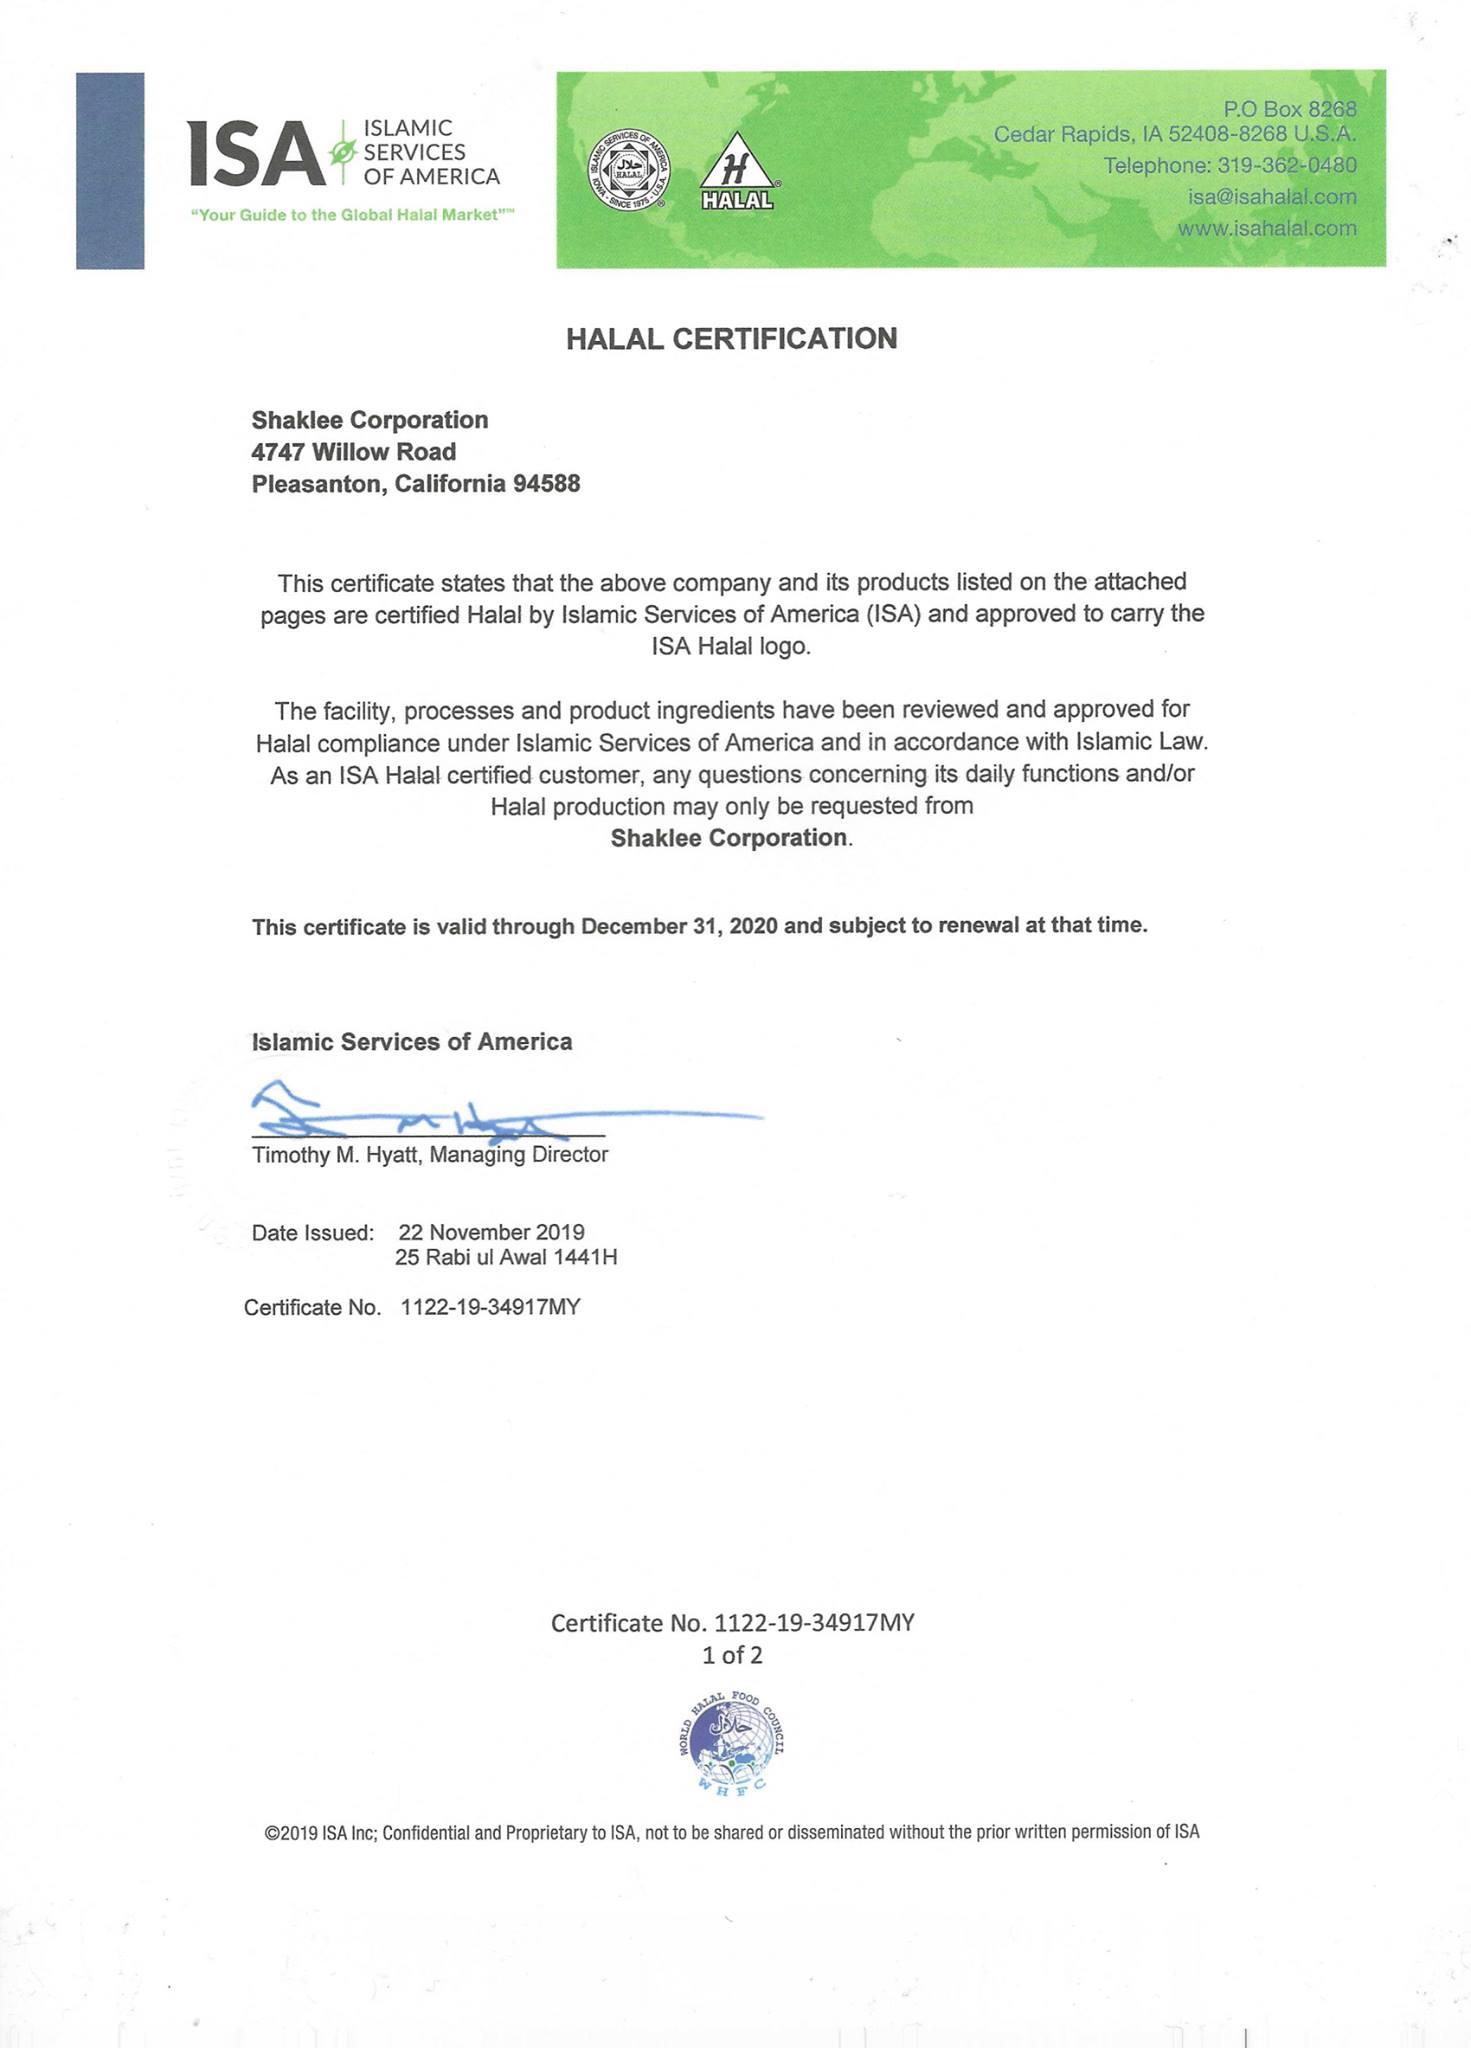 sijil halal shaklee 2020